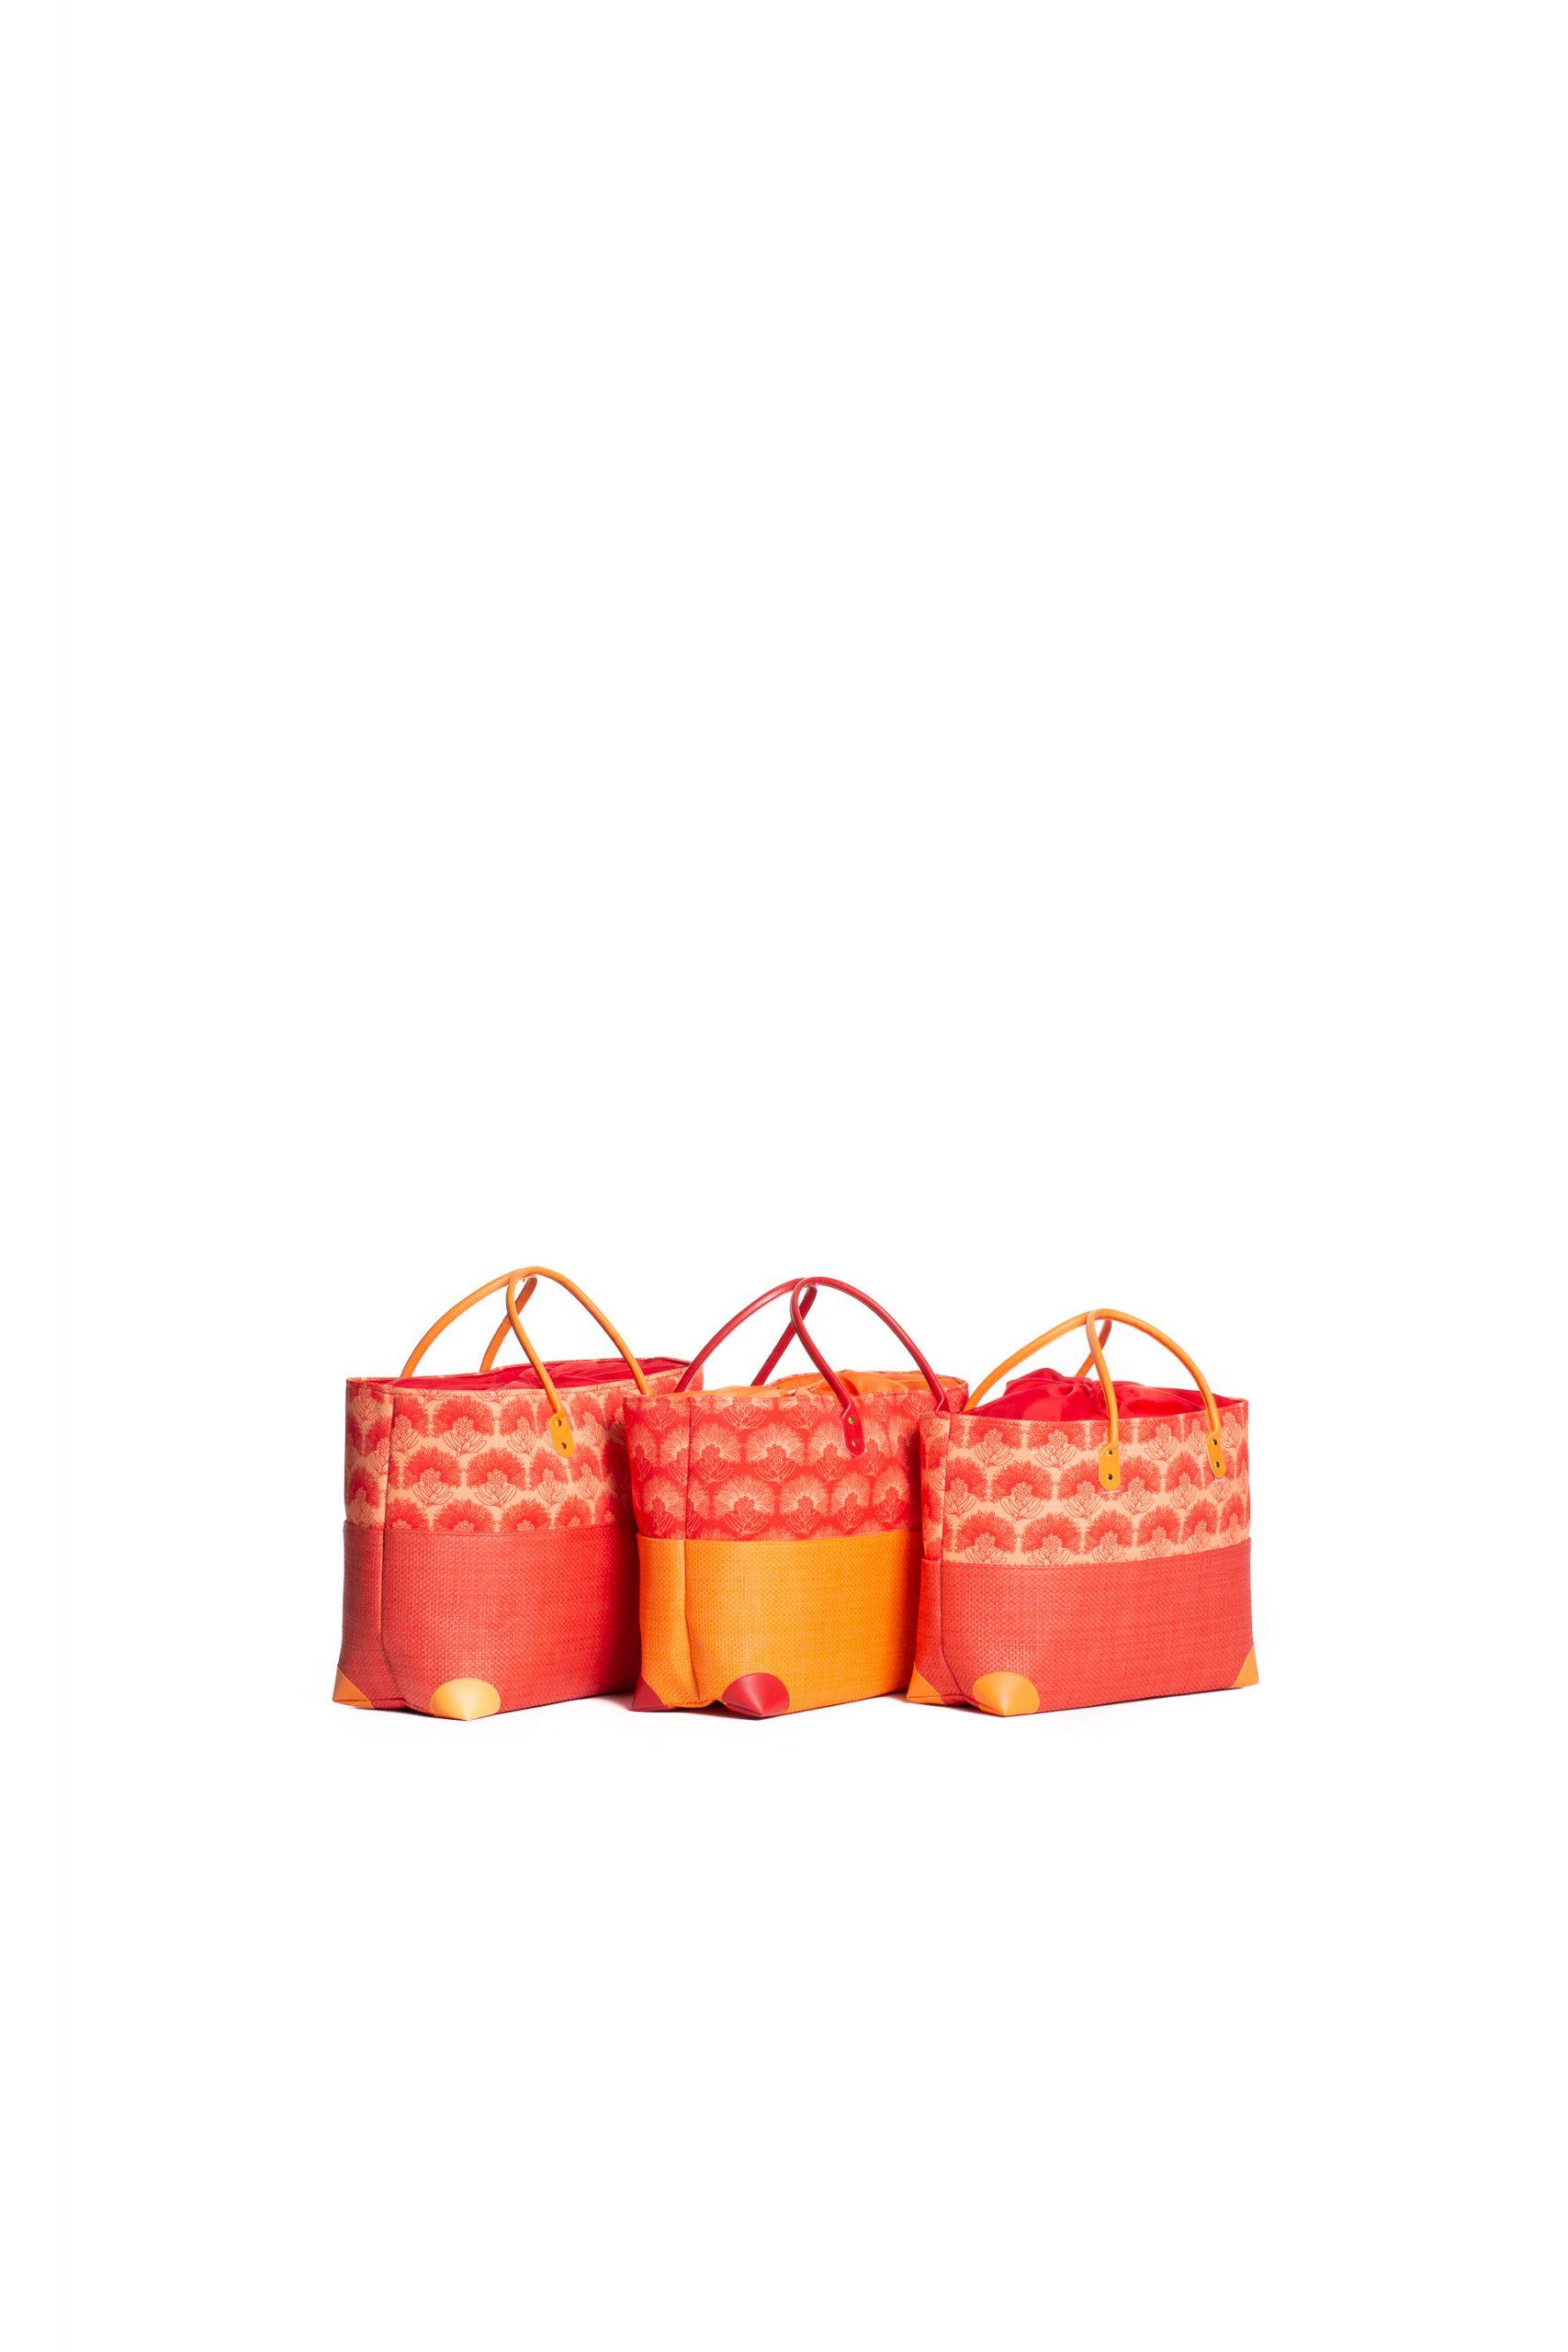 Hula Trio Bag Set in Red